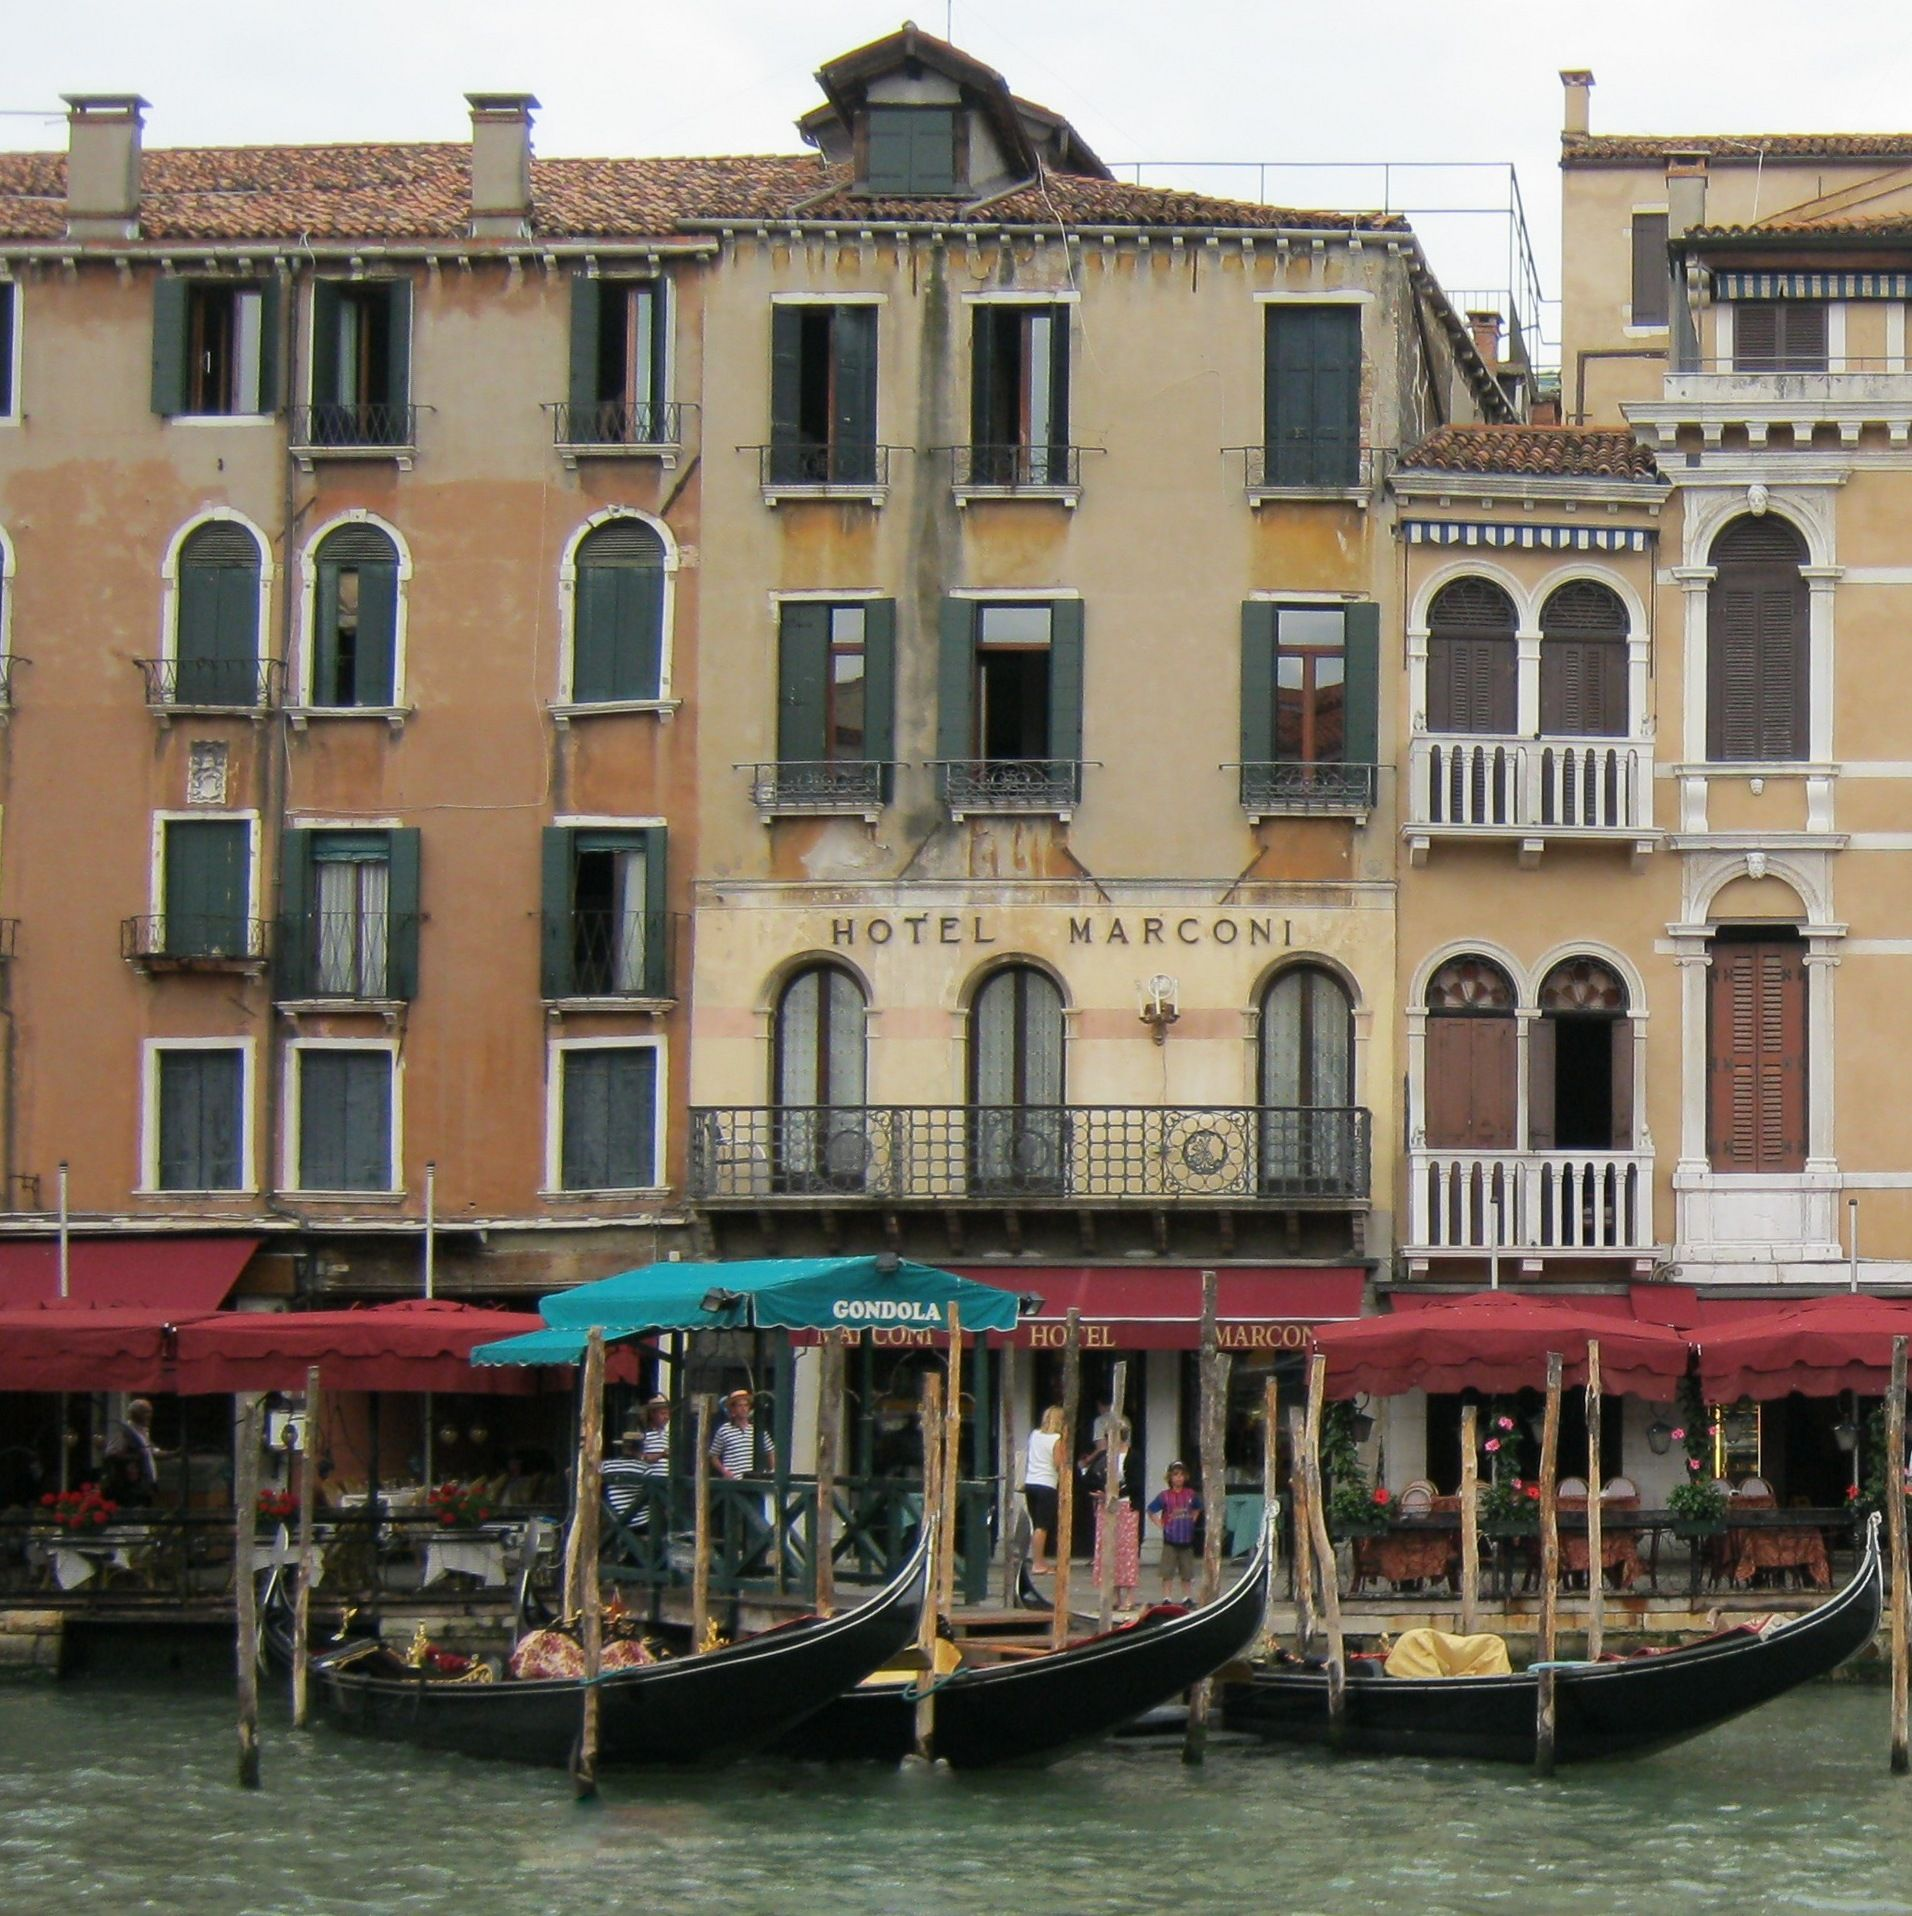 The Hotel Marconi, Venice Italy | プレイス